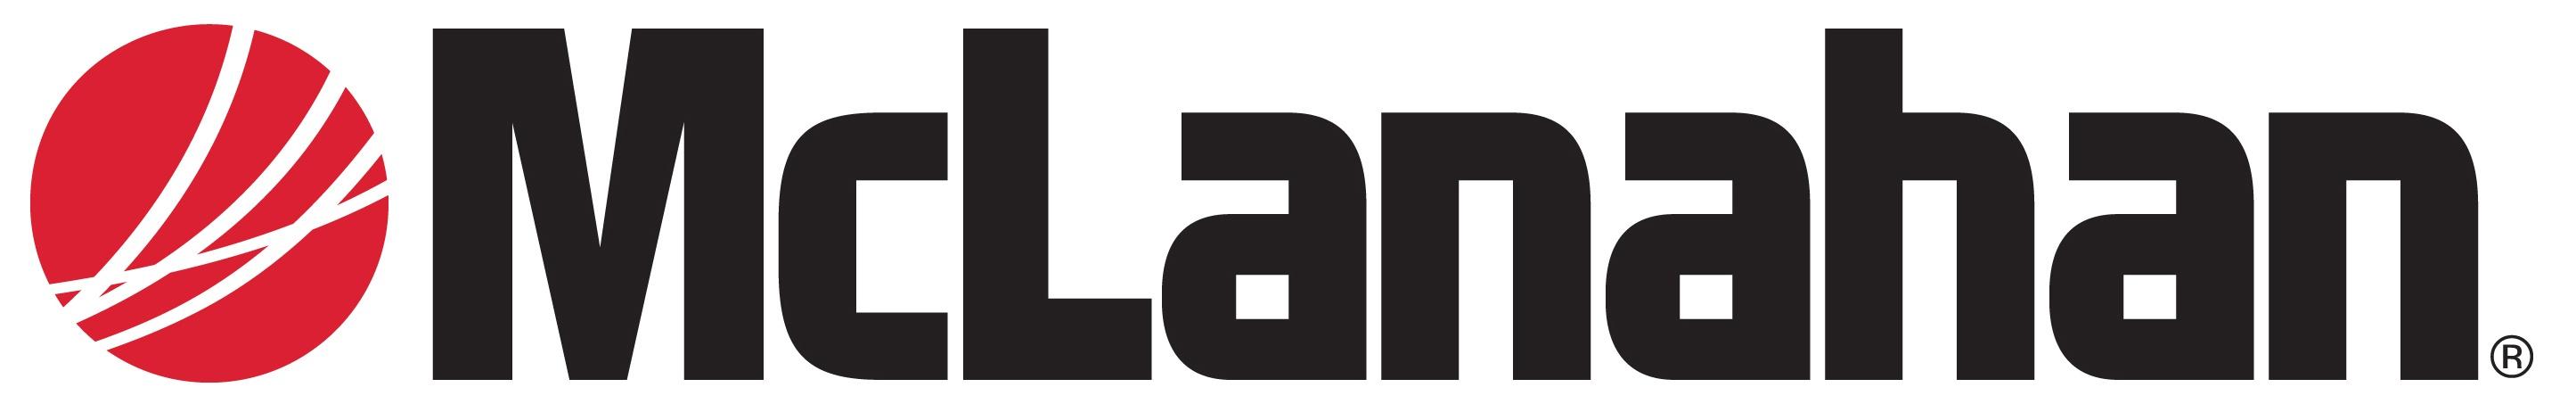 MC Logo_4c blk.jpg